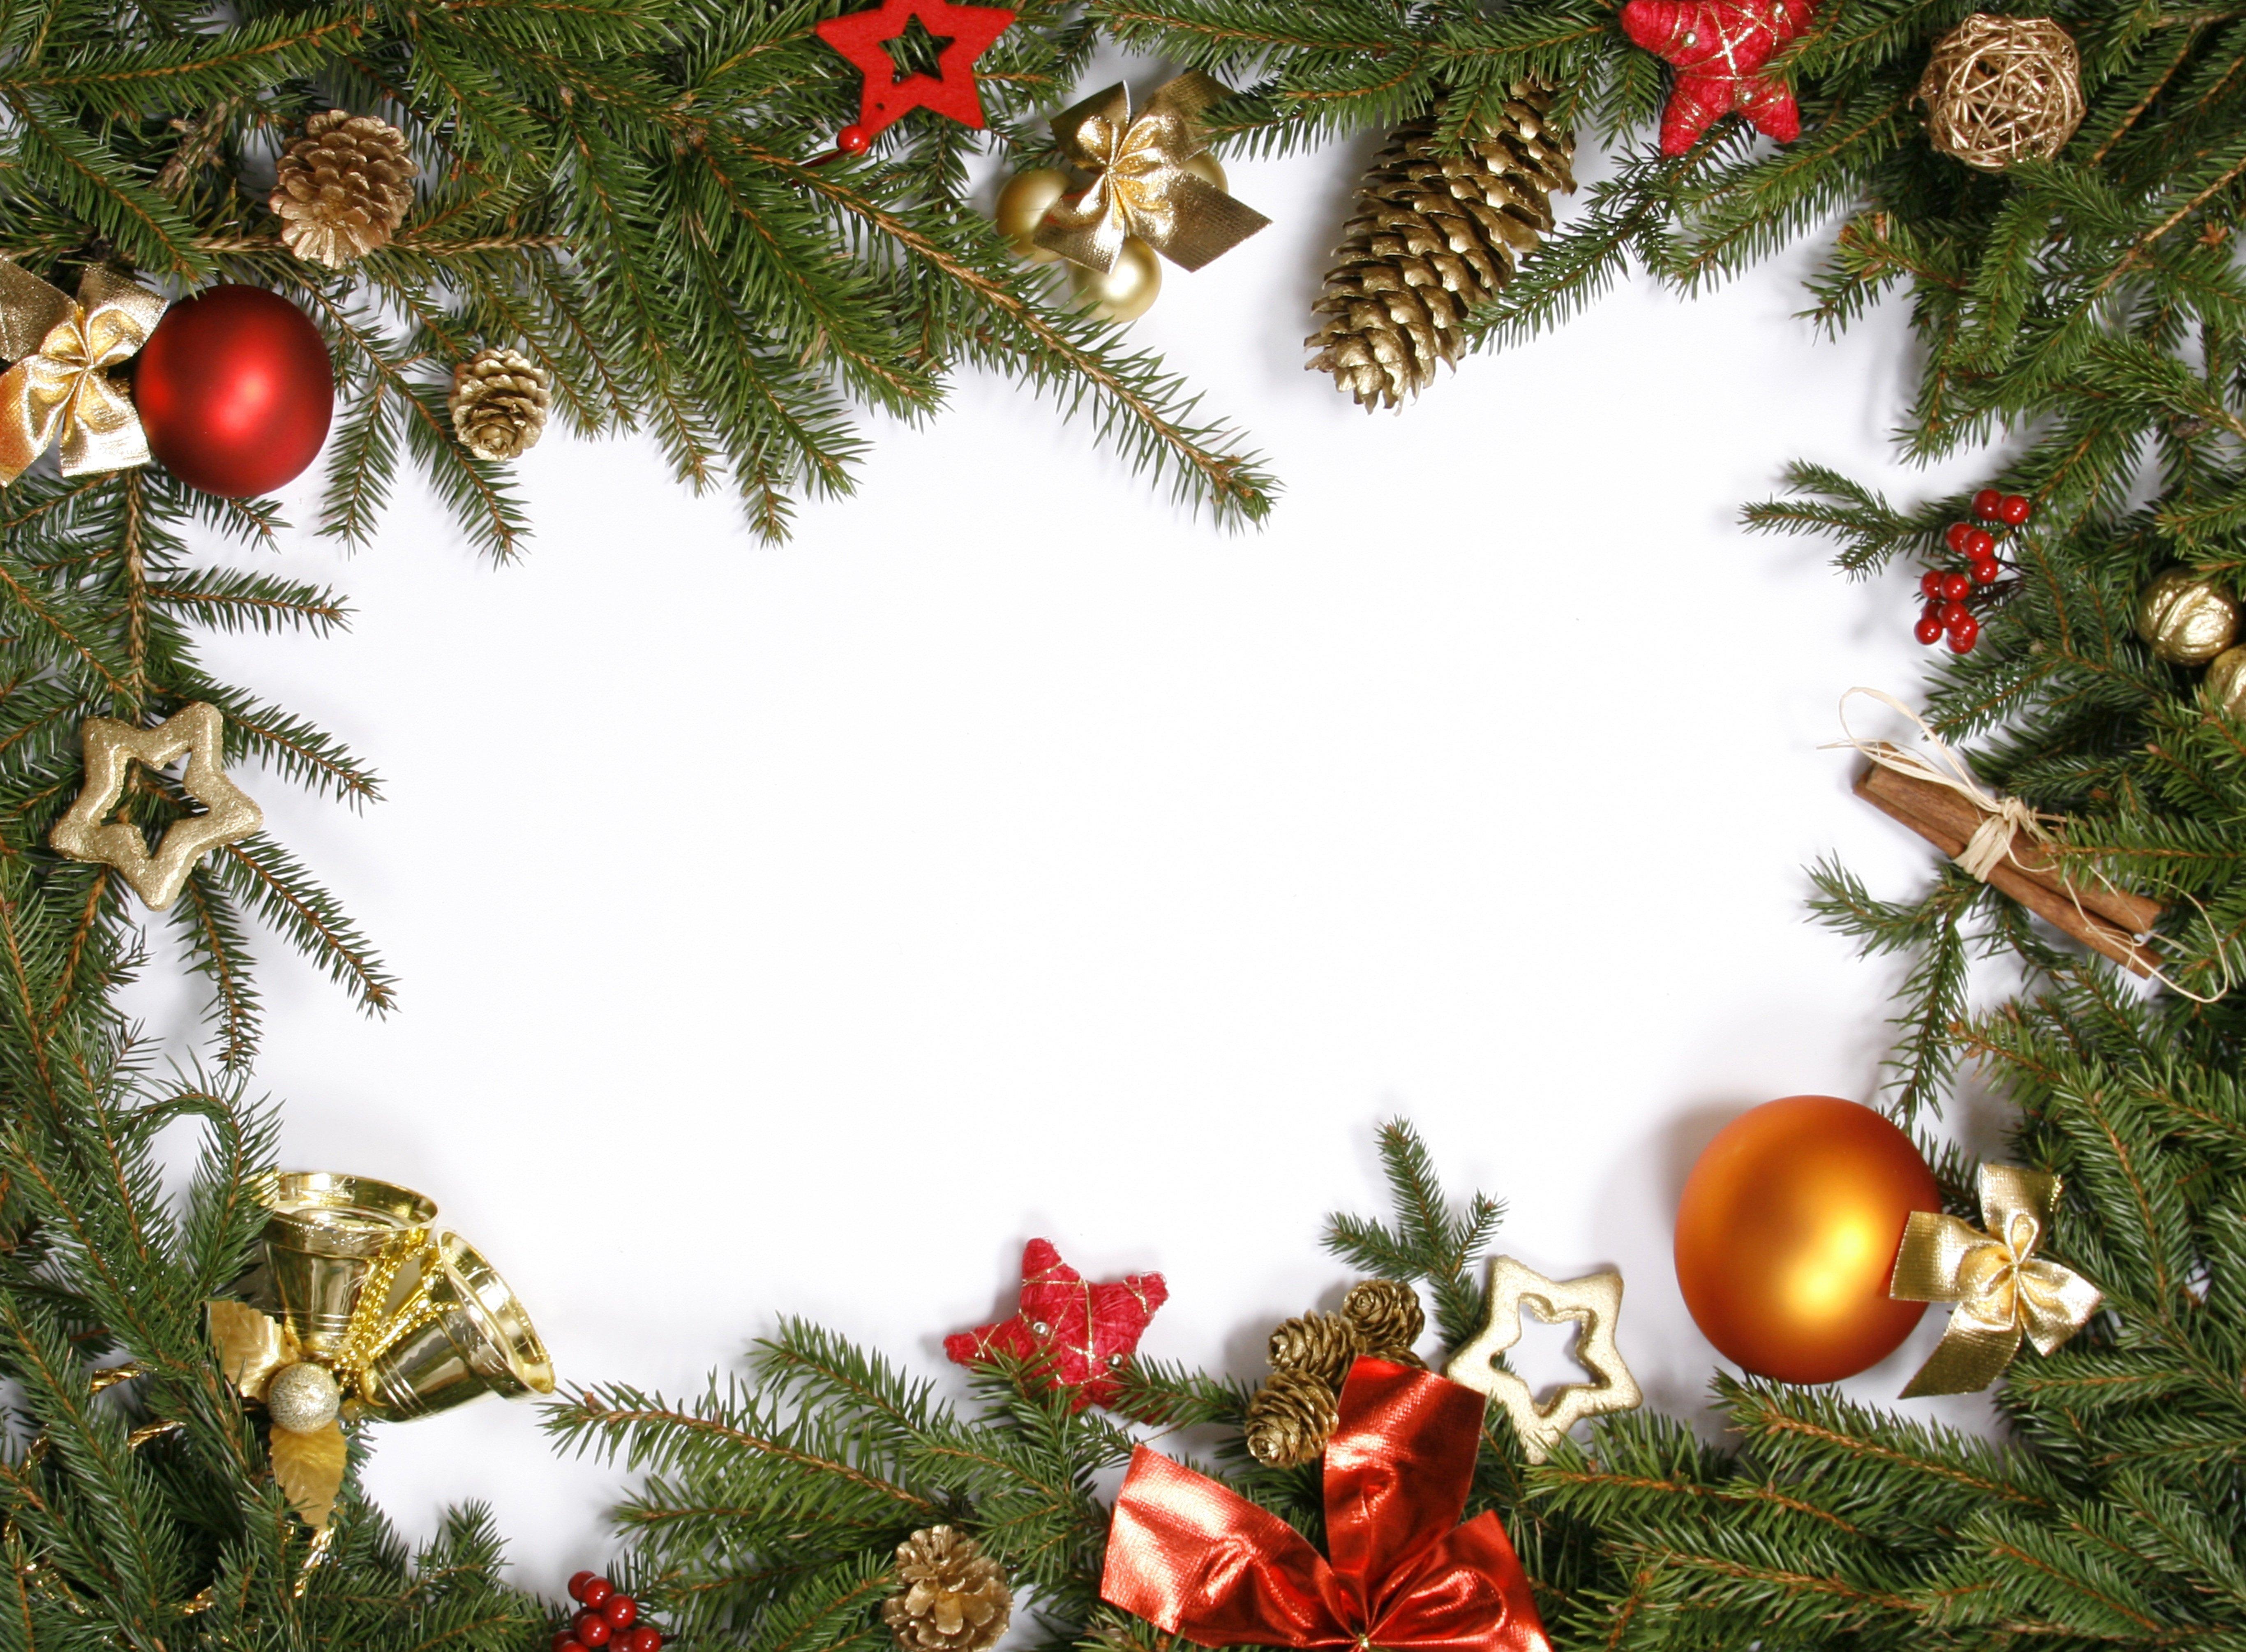 Wallpaper Decoration Christmas Ornaments